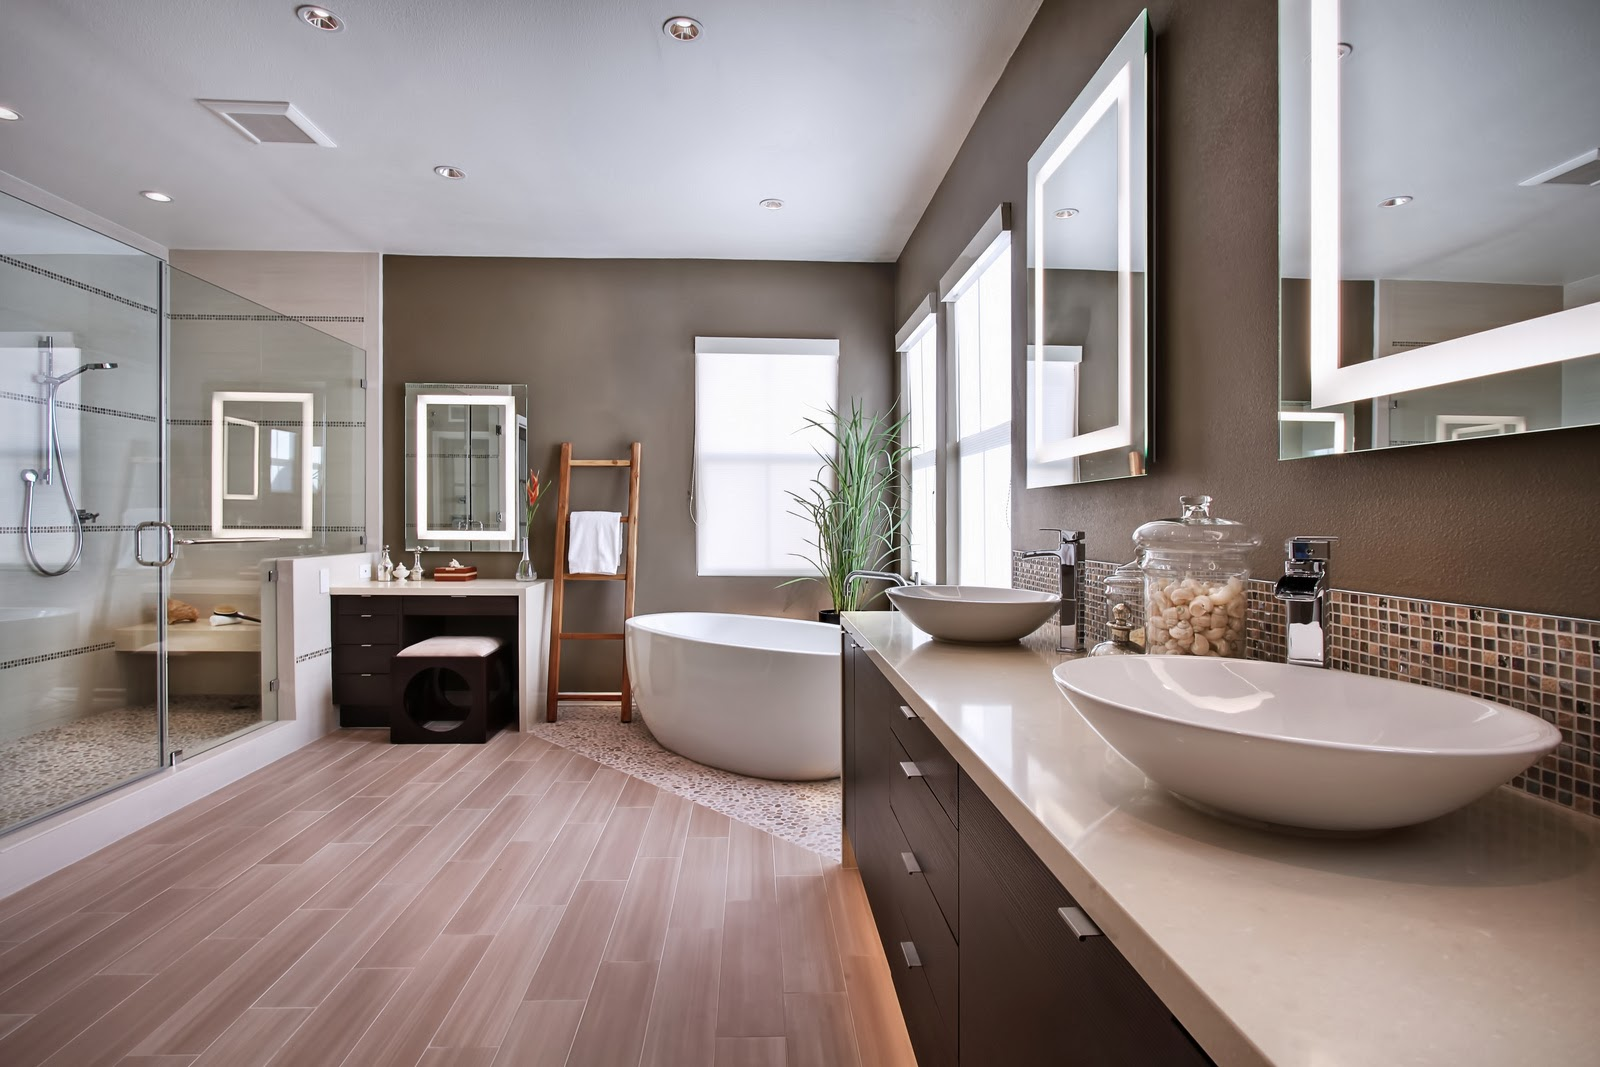 Bathroom Designs 2014 - Moi Tres Jolie on Restroom Ideas  id=17942